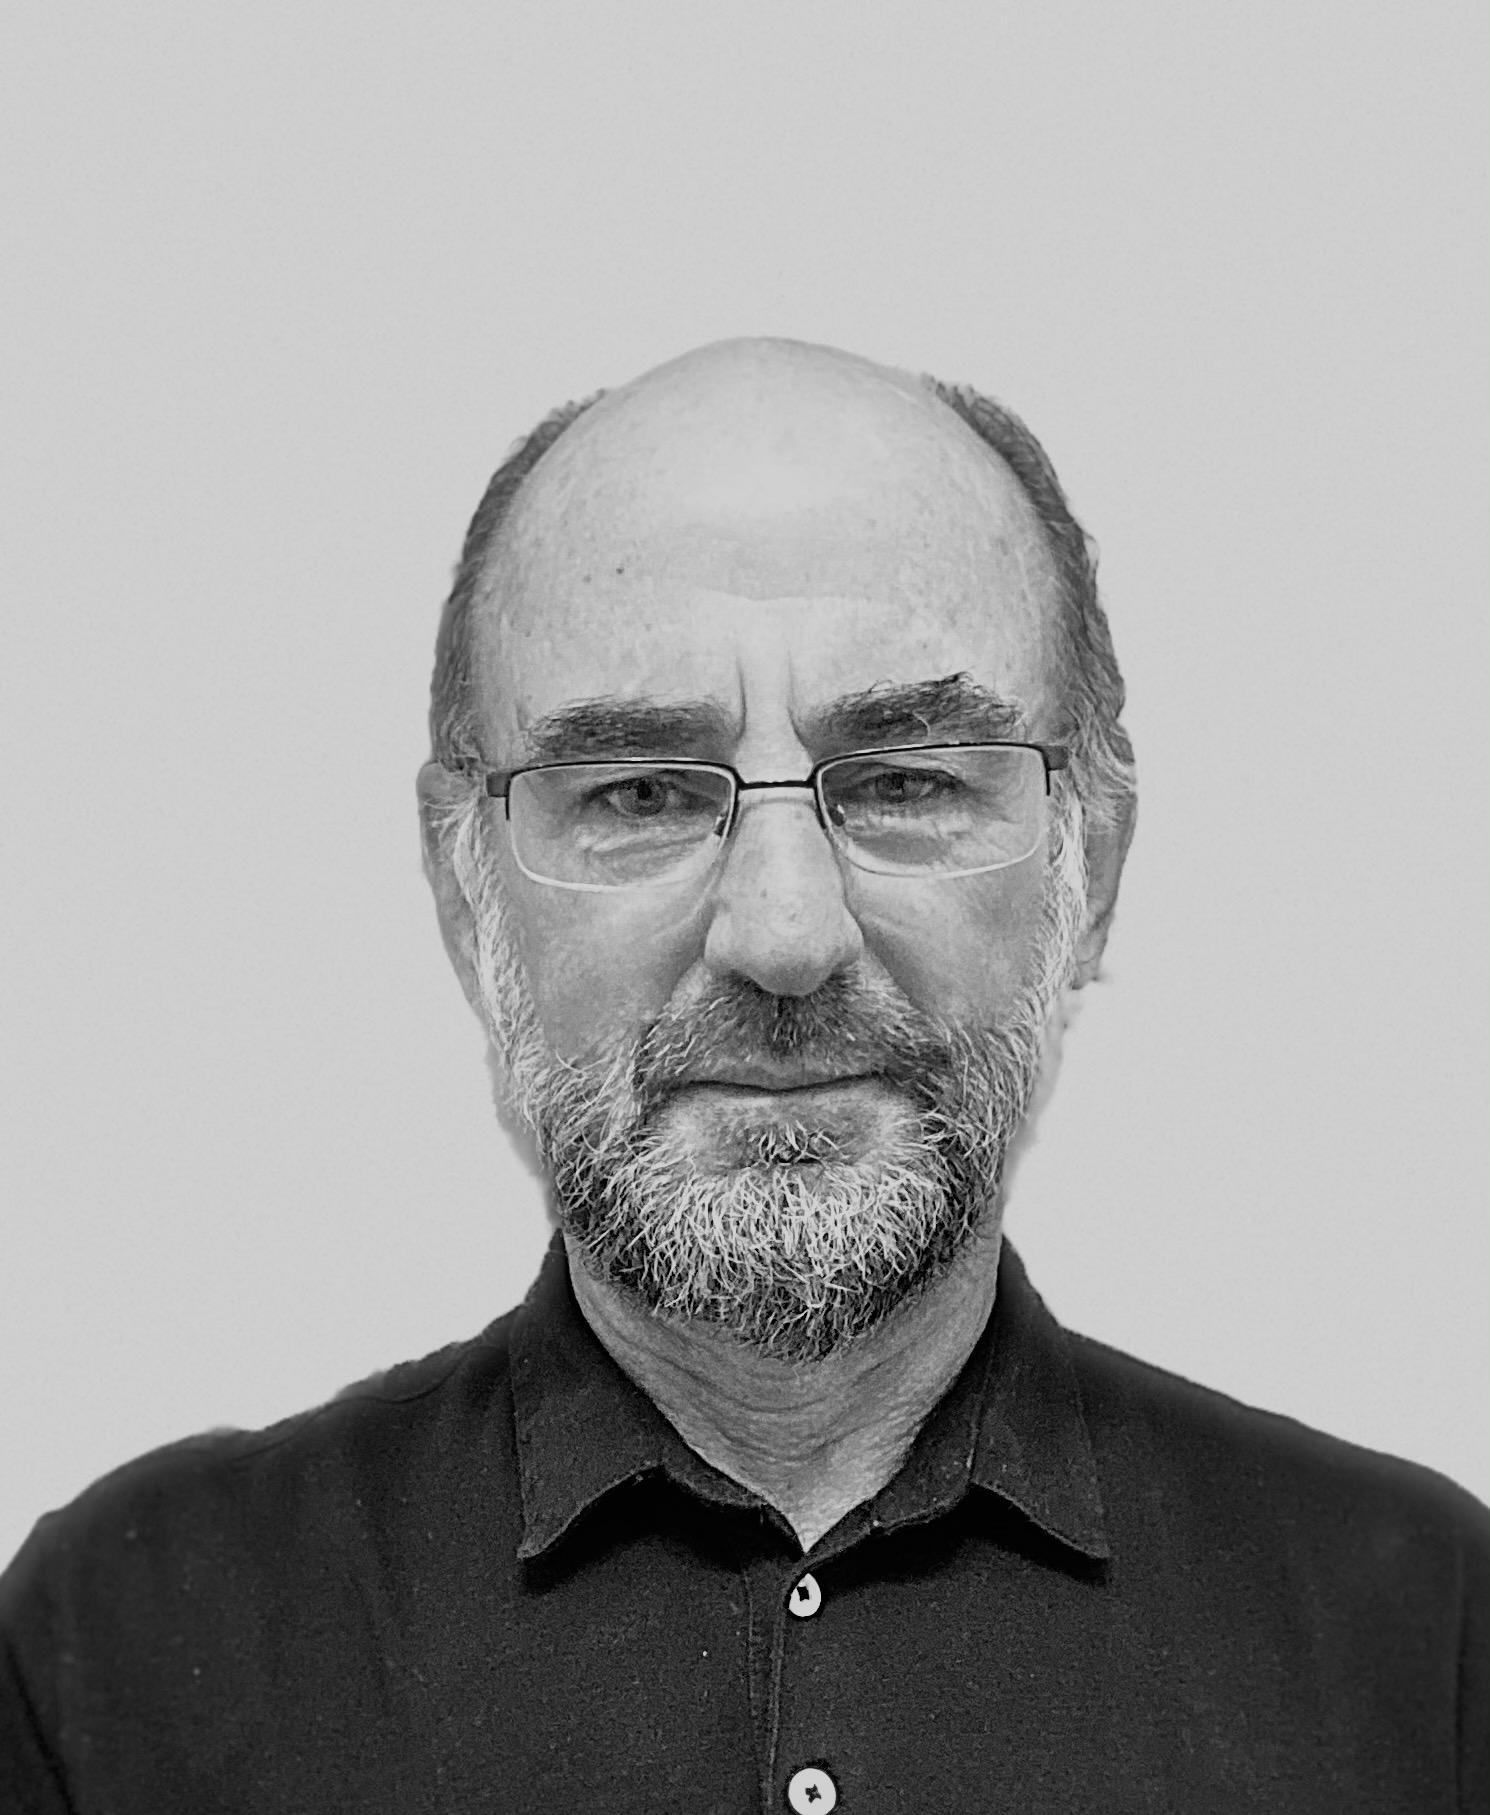 Black and white image of Bruce Brandfon